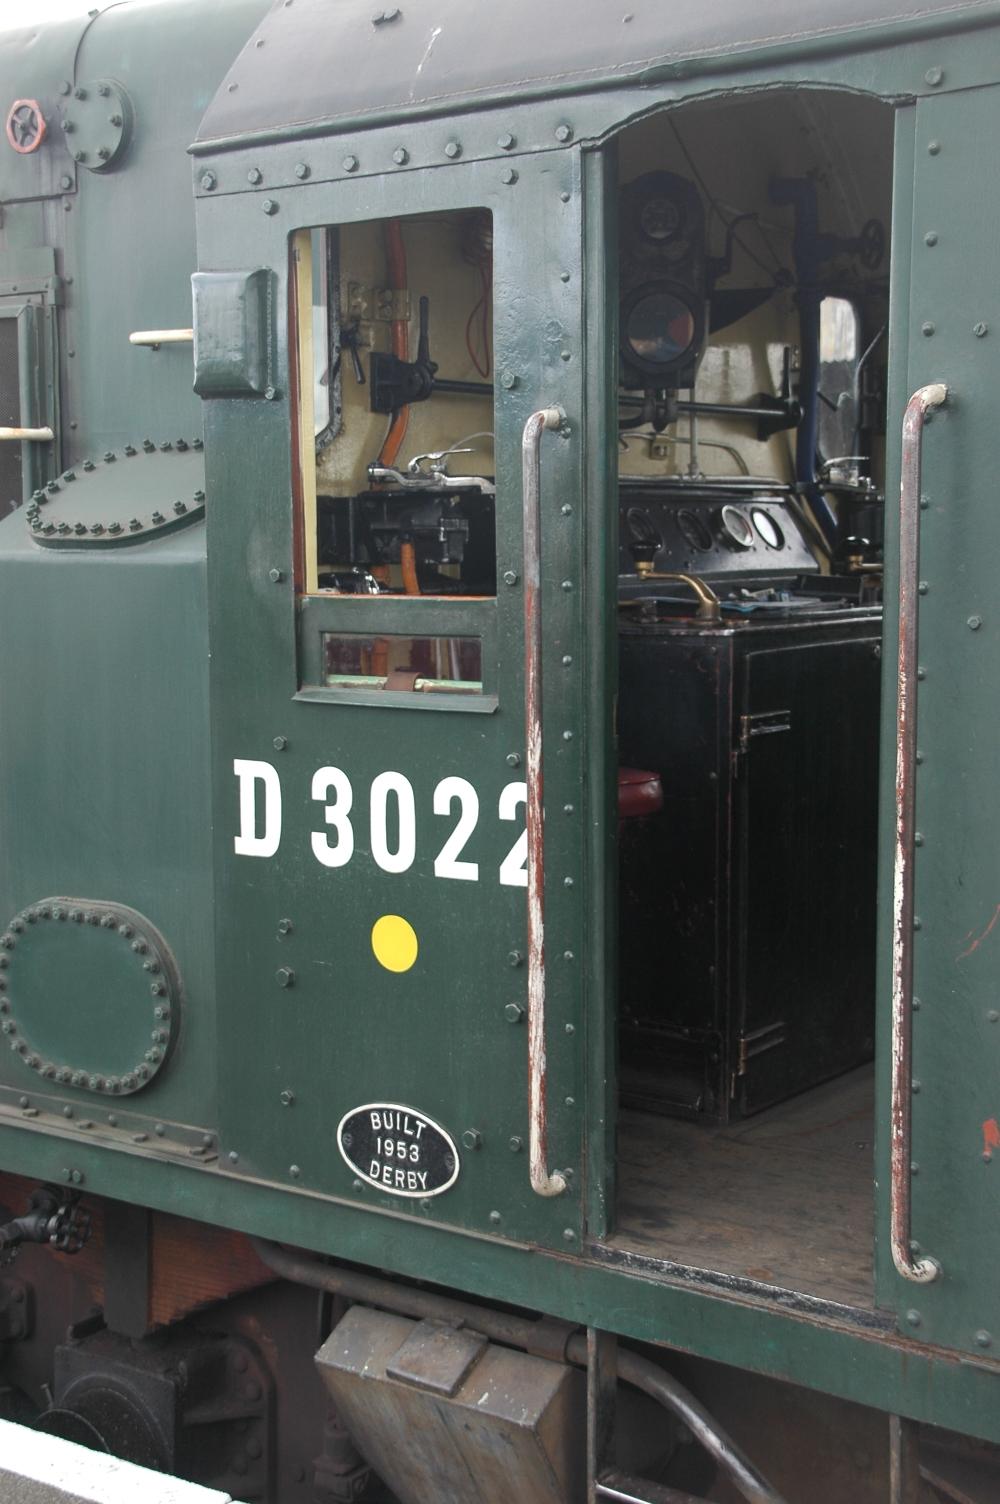 D 3022